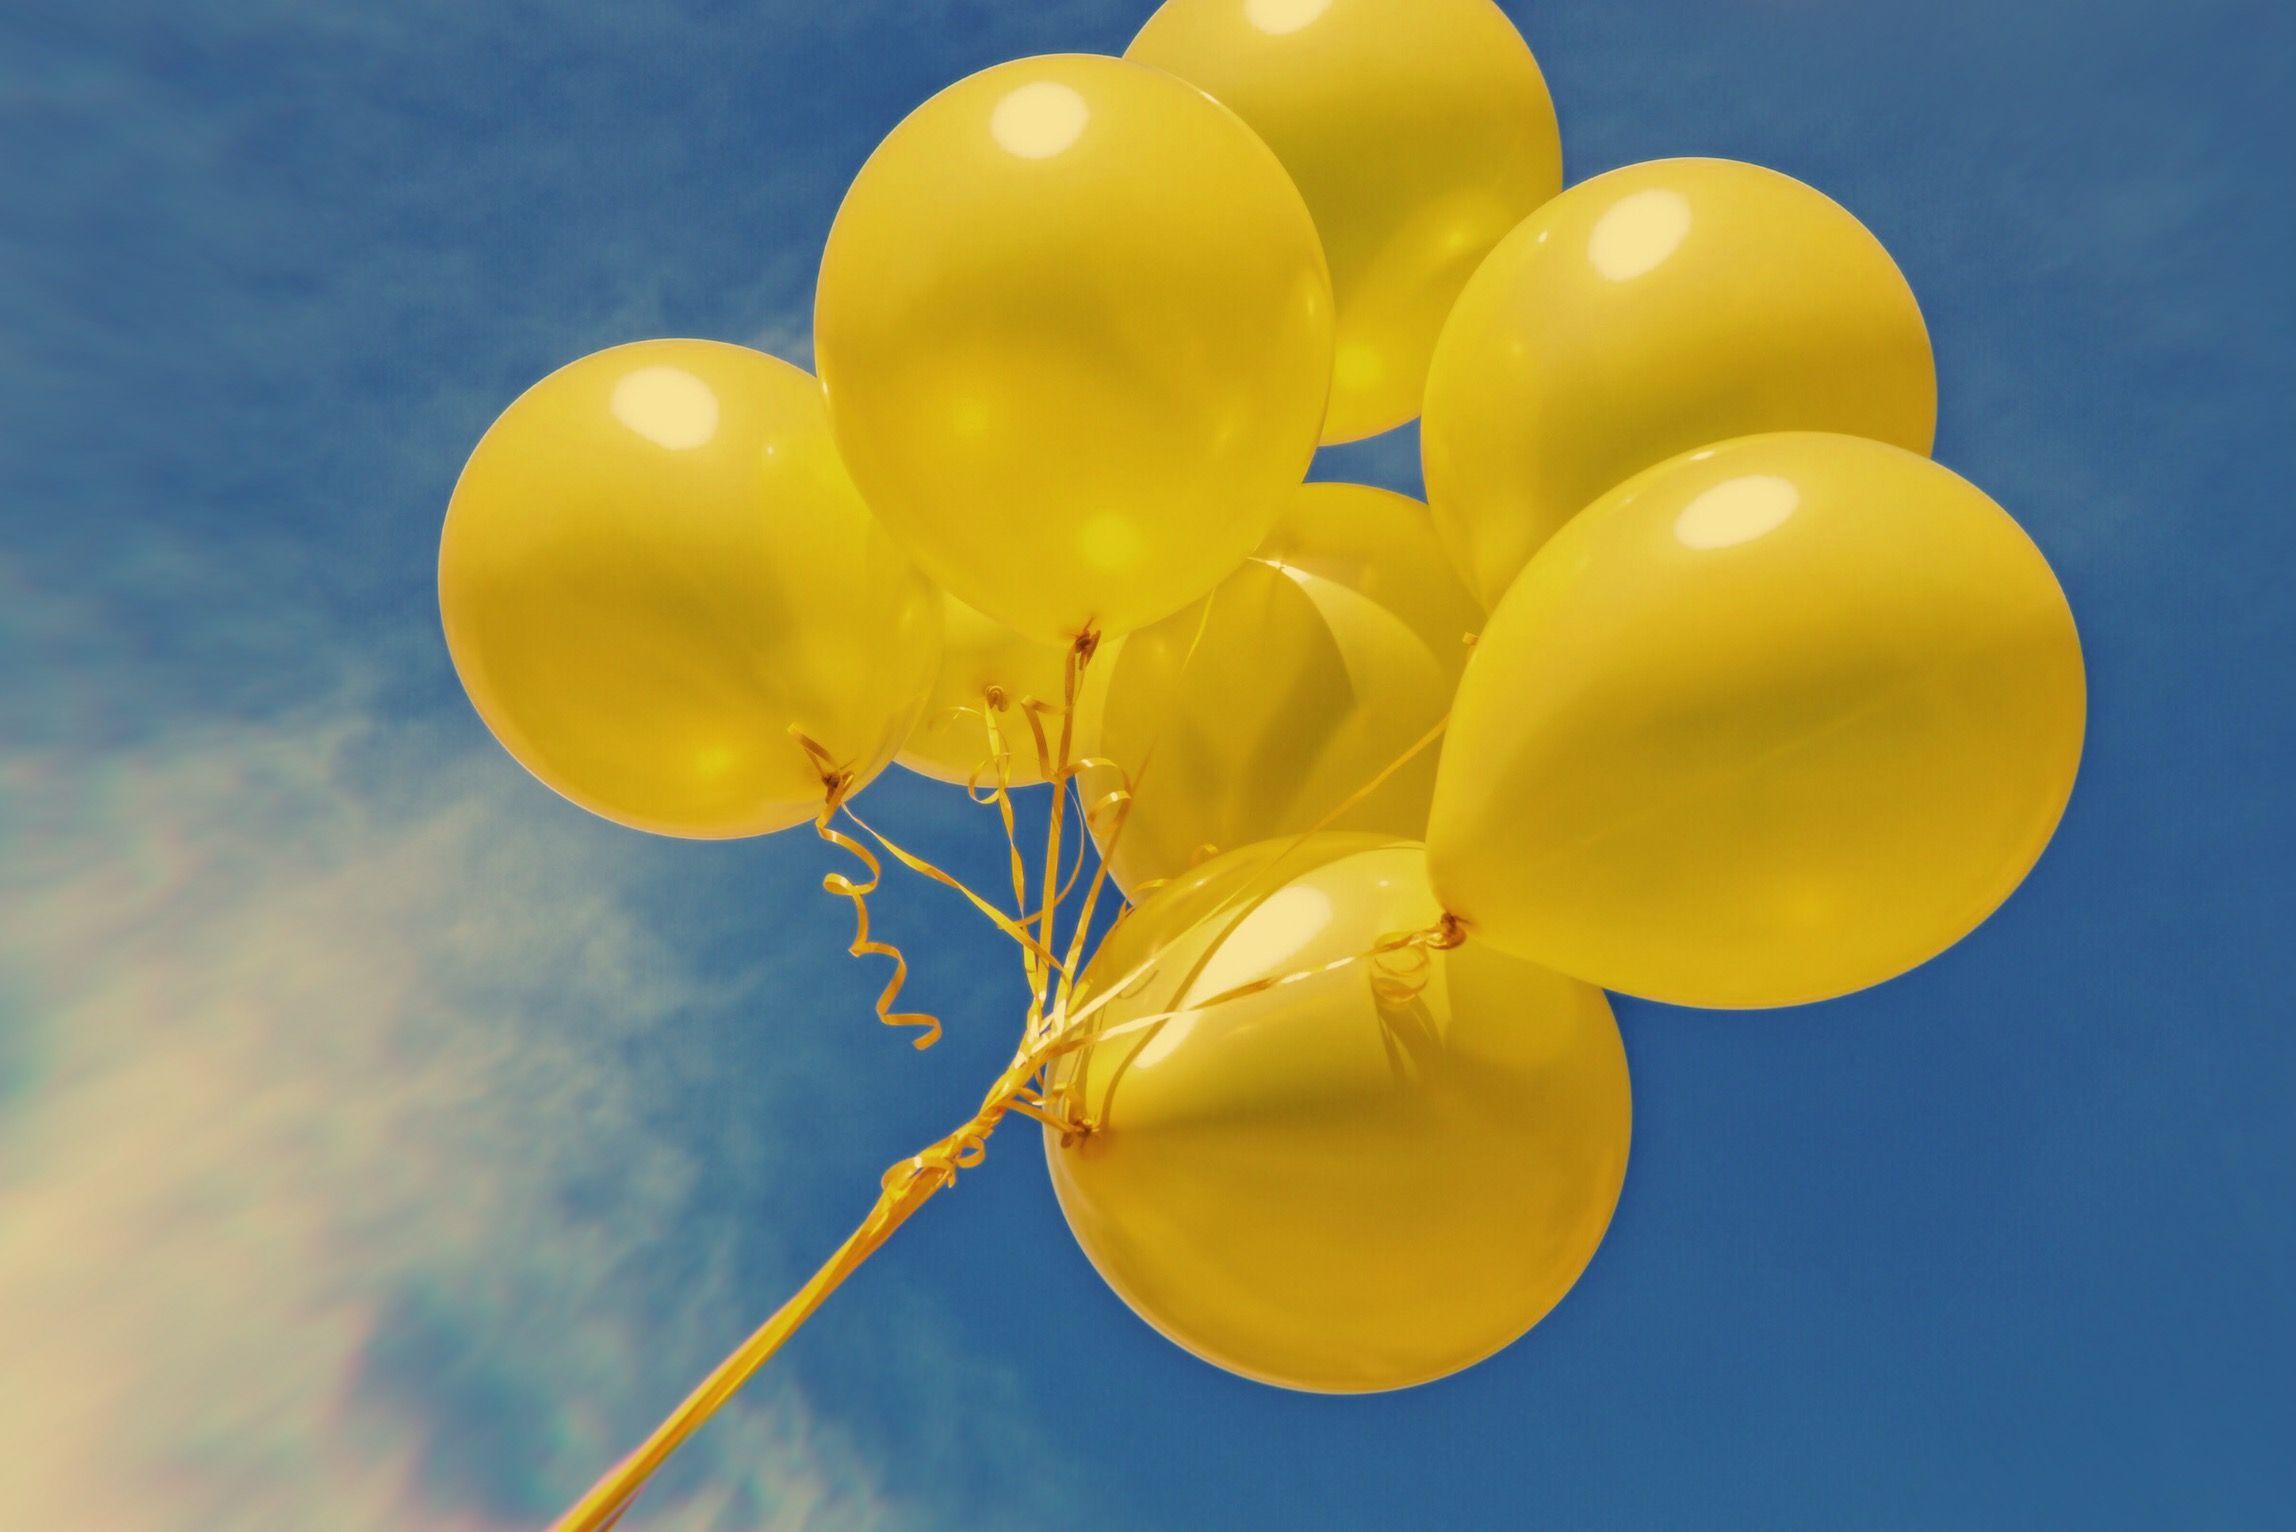 Beloved Balloons